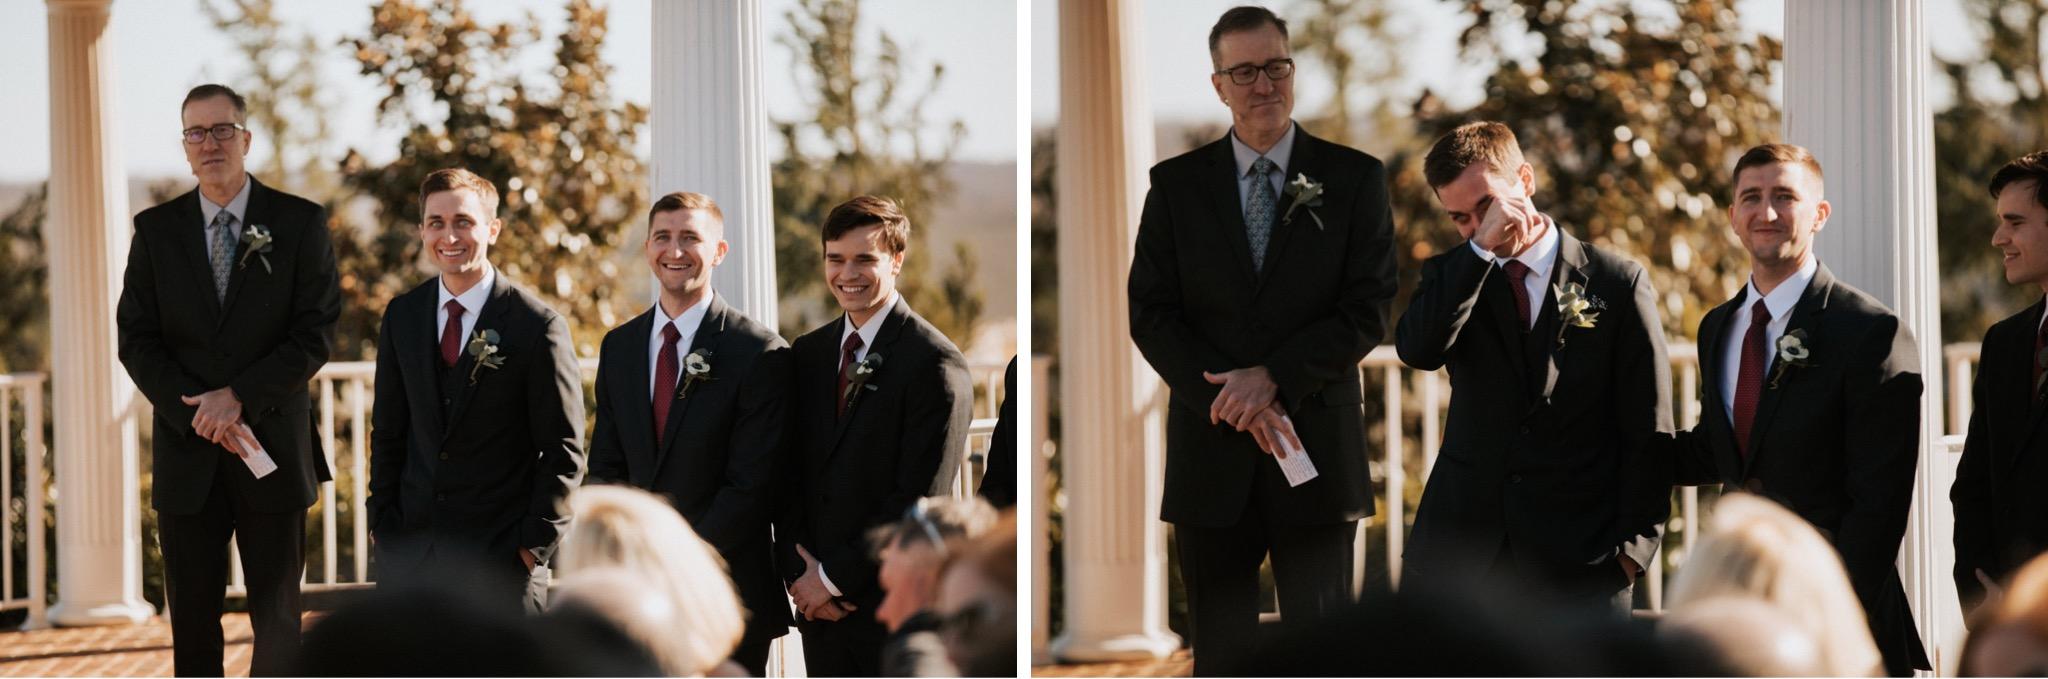 42_West Manor Estate Weddings - Pat Cori Photography-89_West Manor Estate Weddings - Pat Cori Photography-88_Ceremony_PatCoriPhotography_VirginiaWeddingPhotographer_WestManorEstate_Wedding.jpg